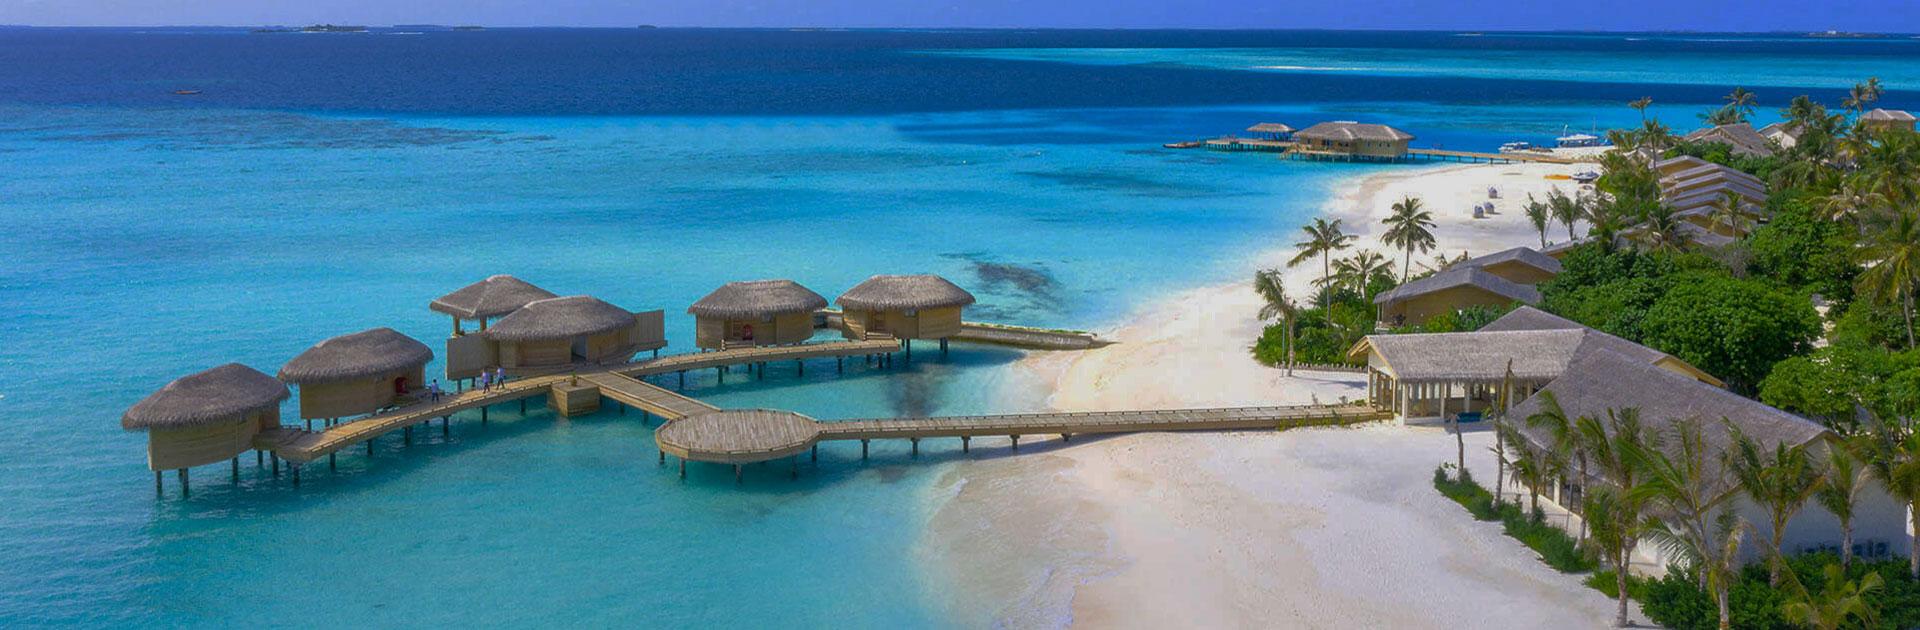 X Cocoon Maldivas 0008 Spa 4